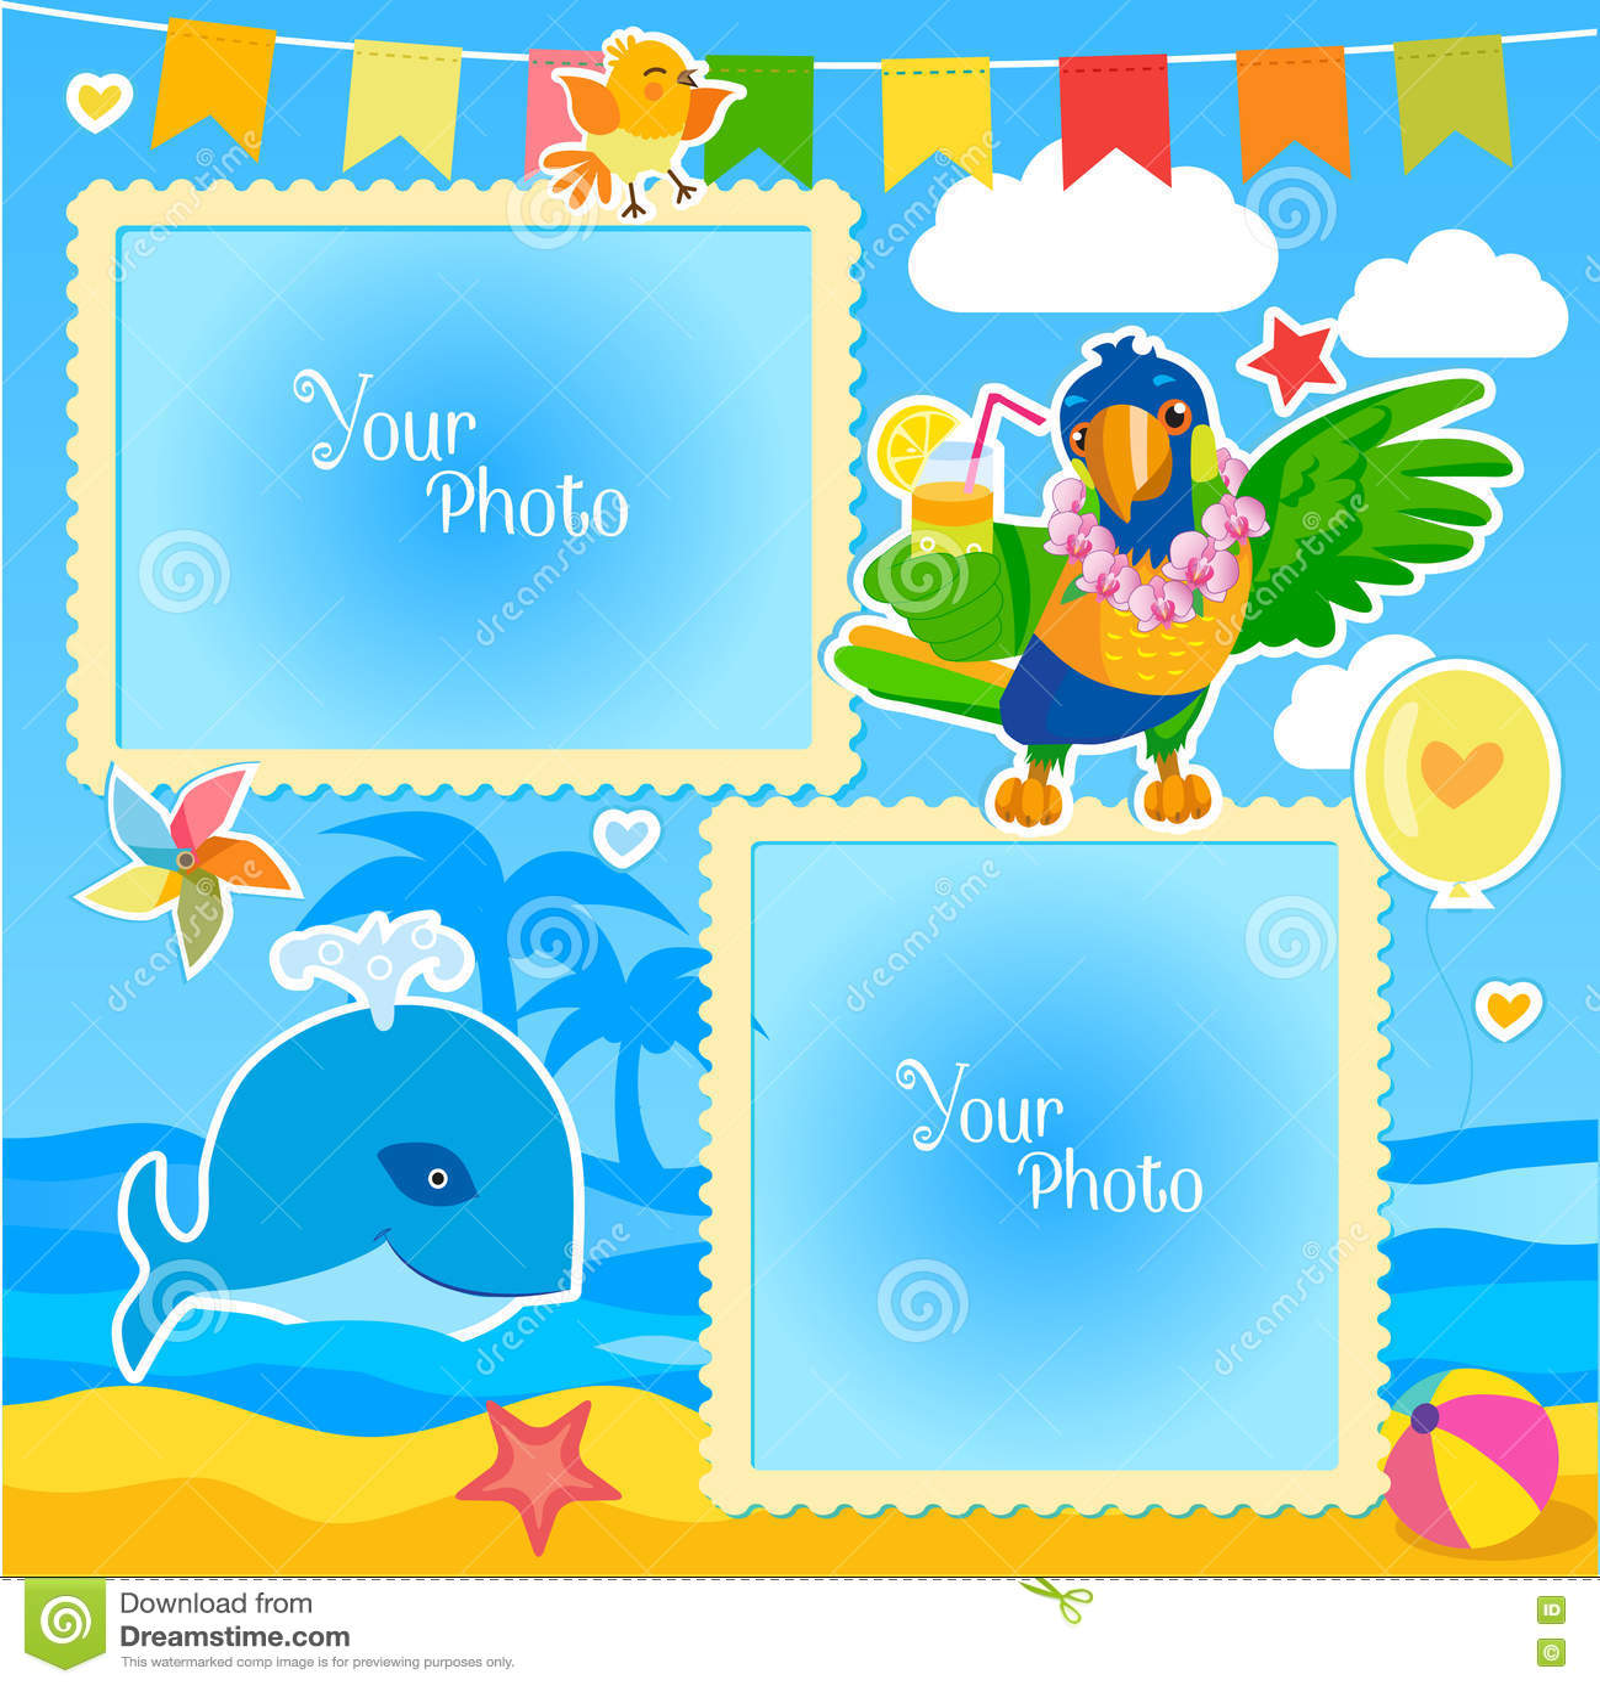 Parrot Wallpaper Border